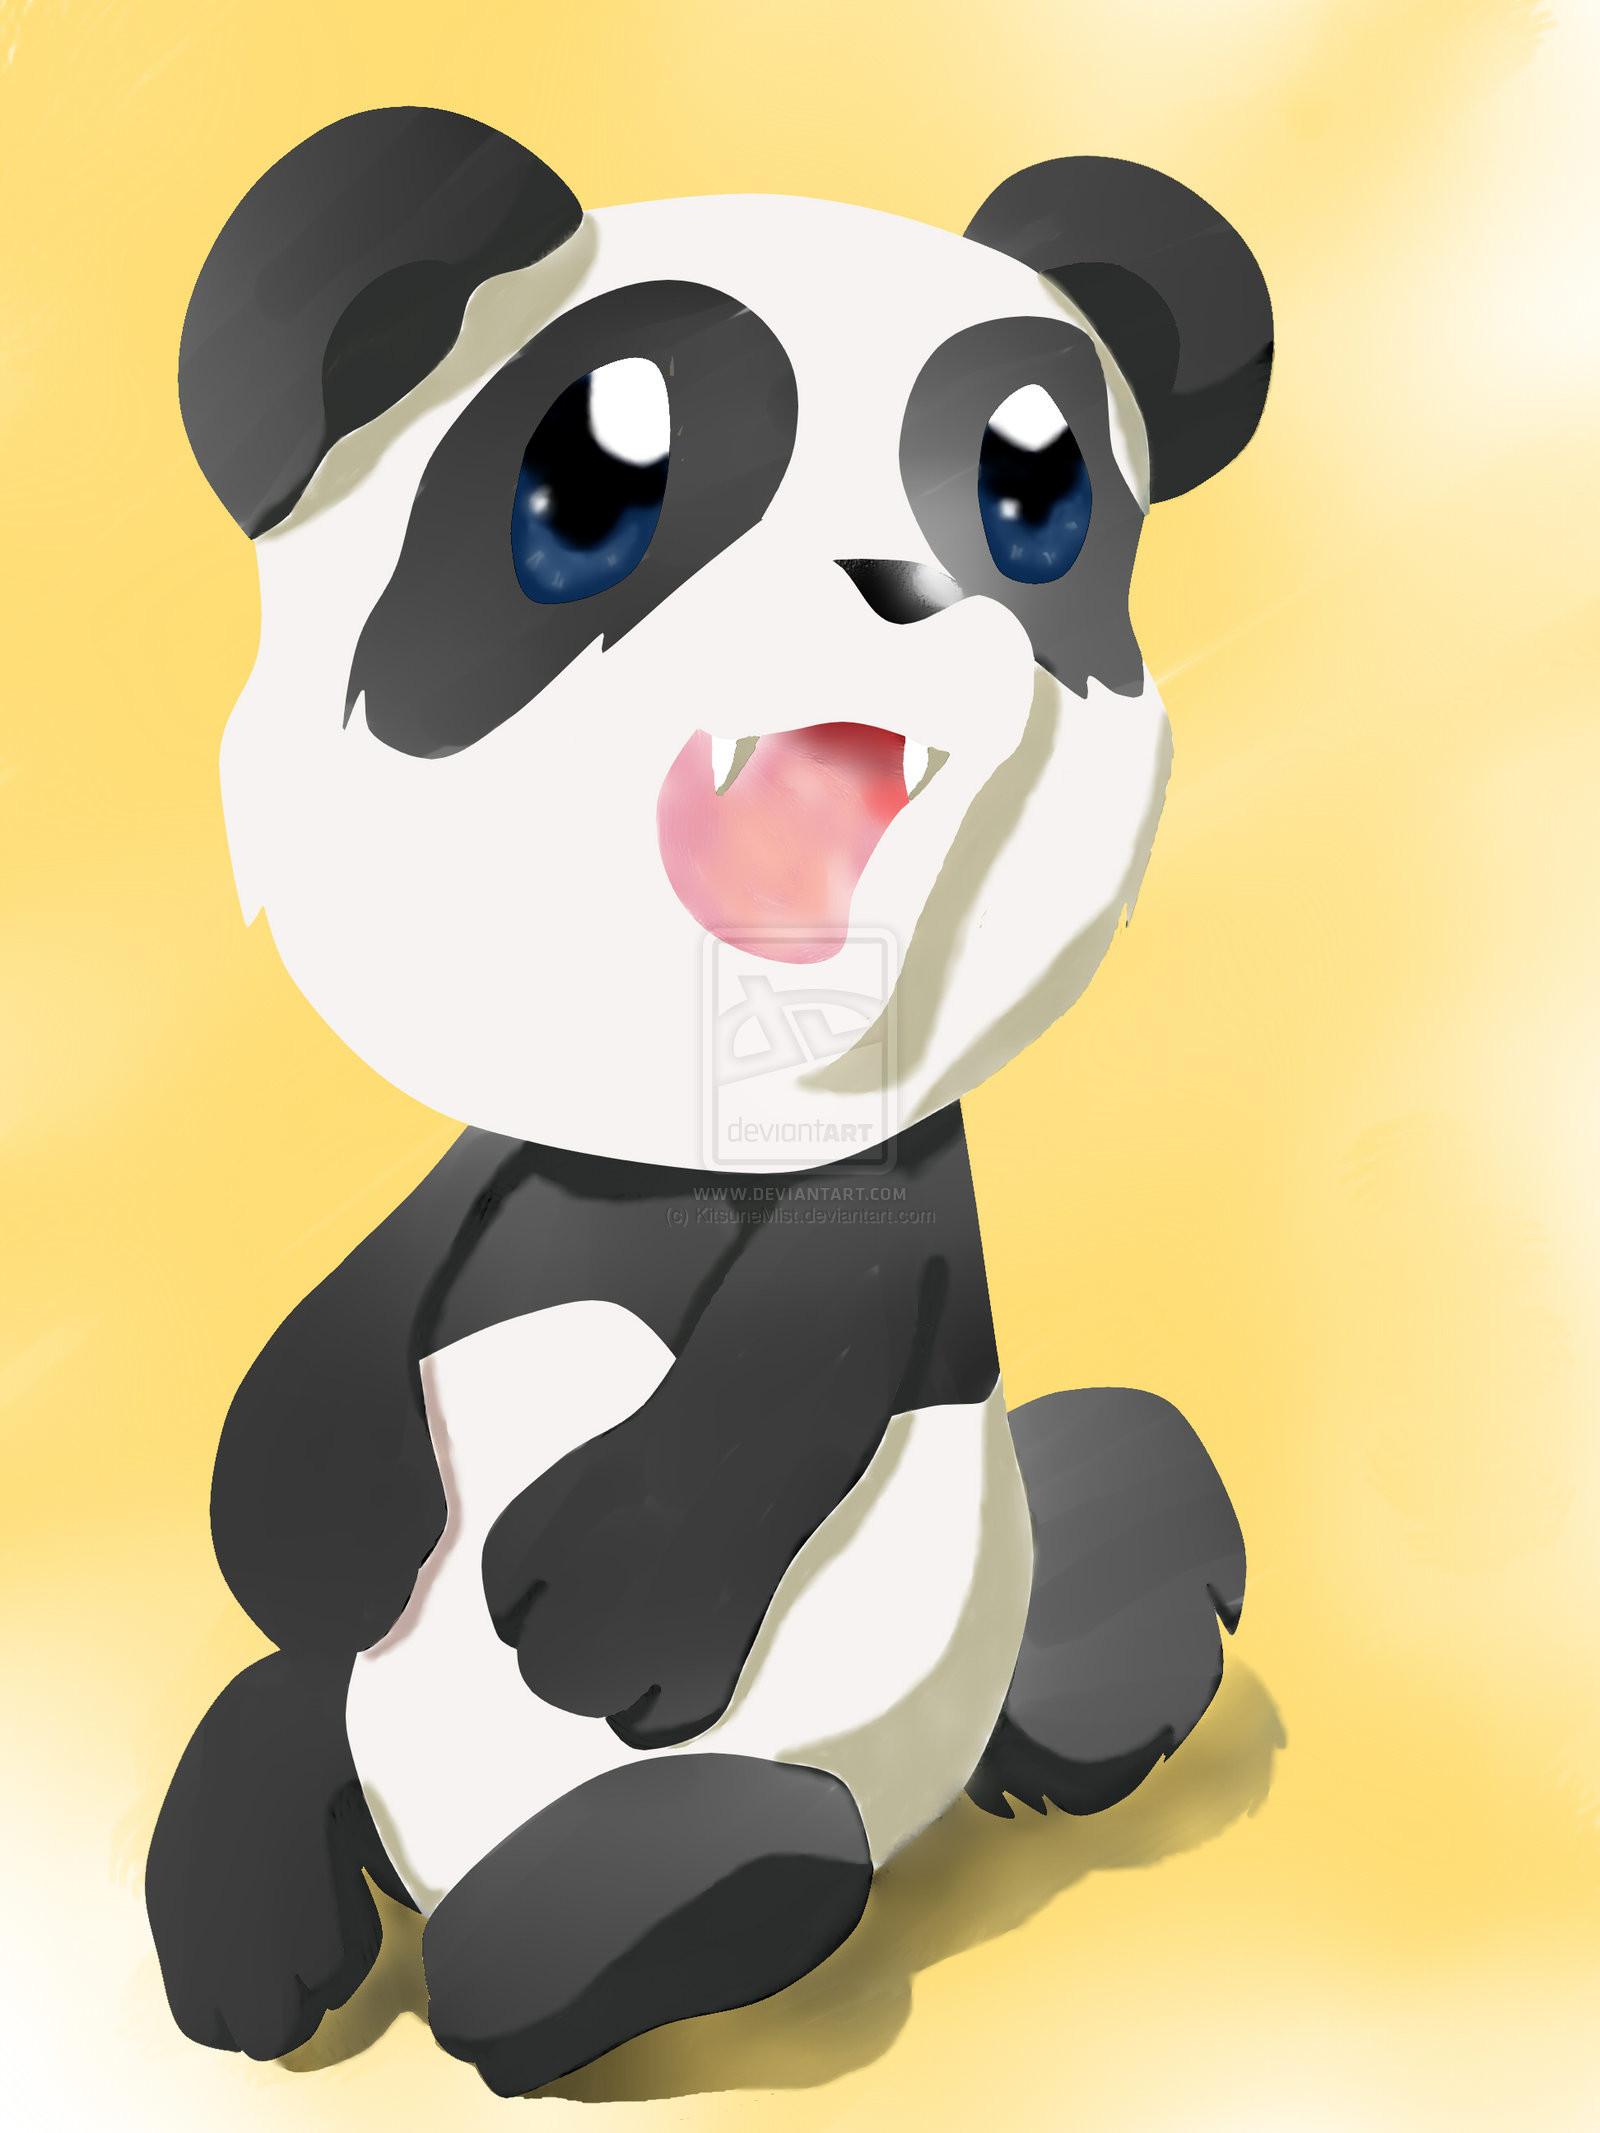 Chibi Panda Wallpaper Chibi panda by kitsunemist